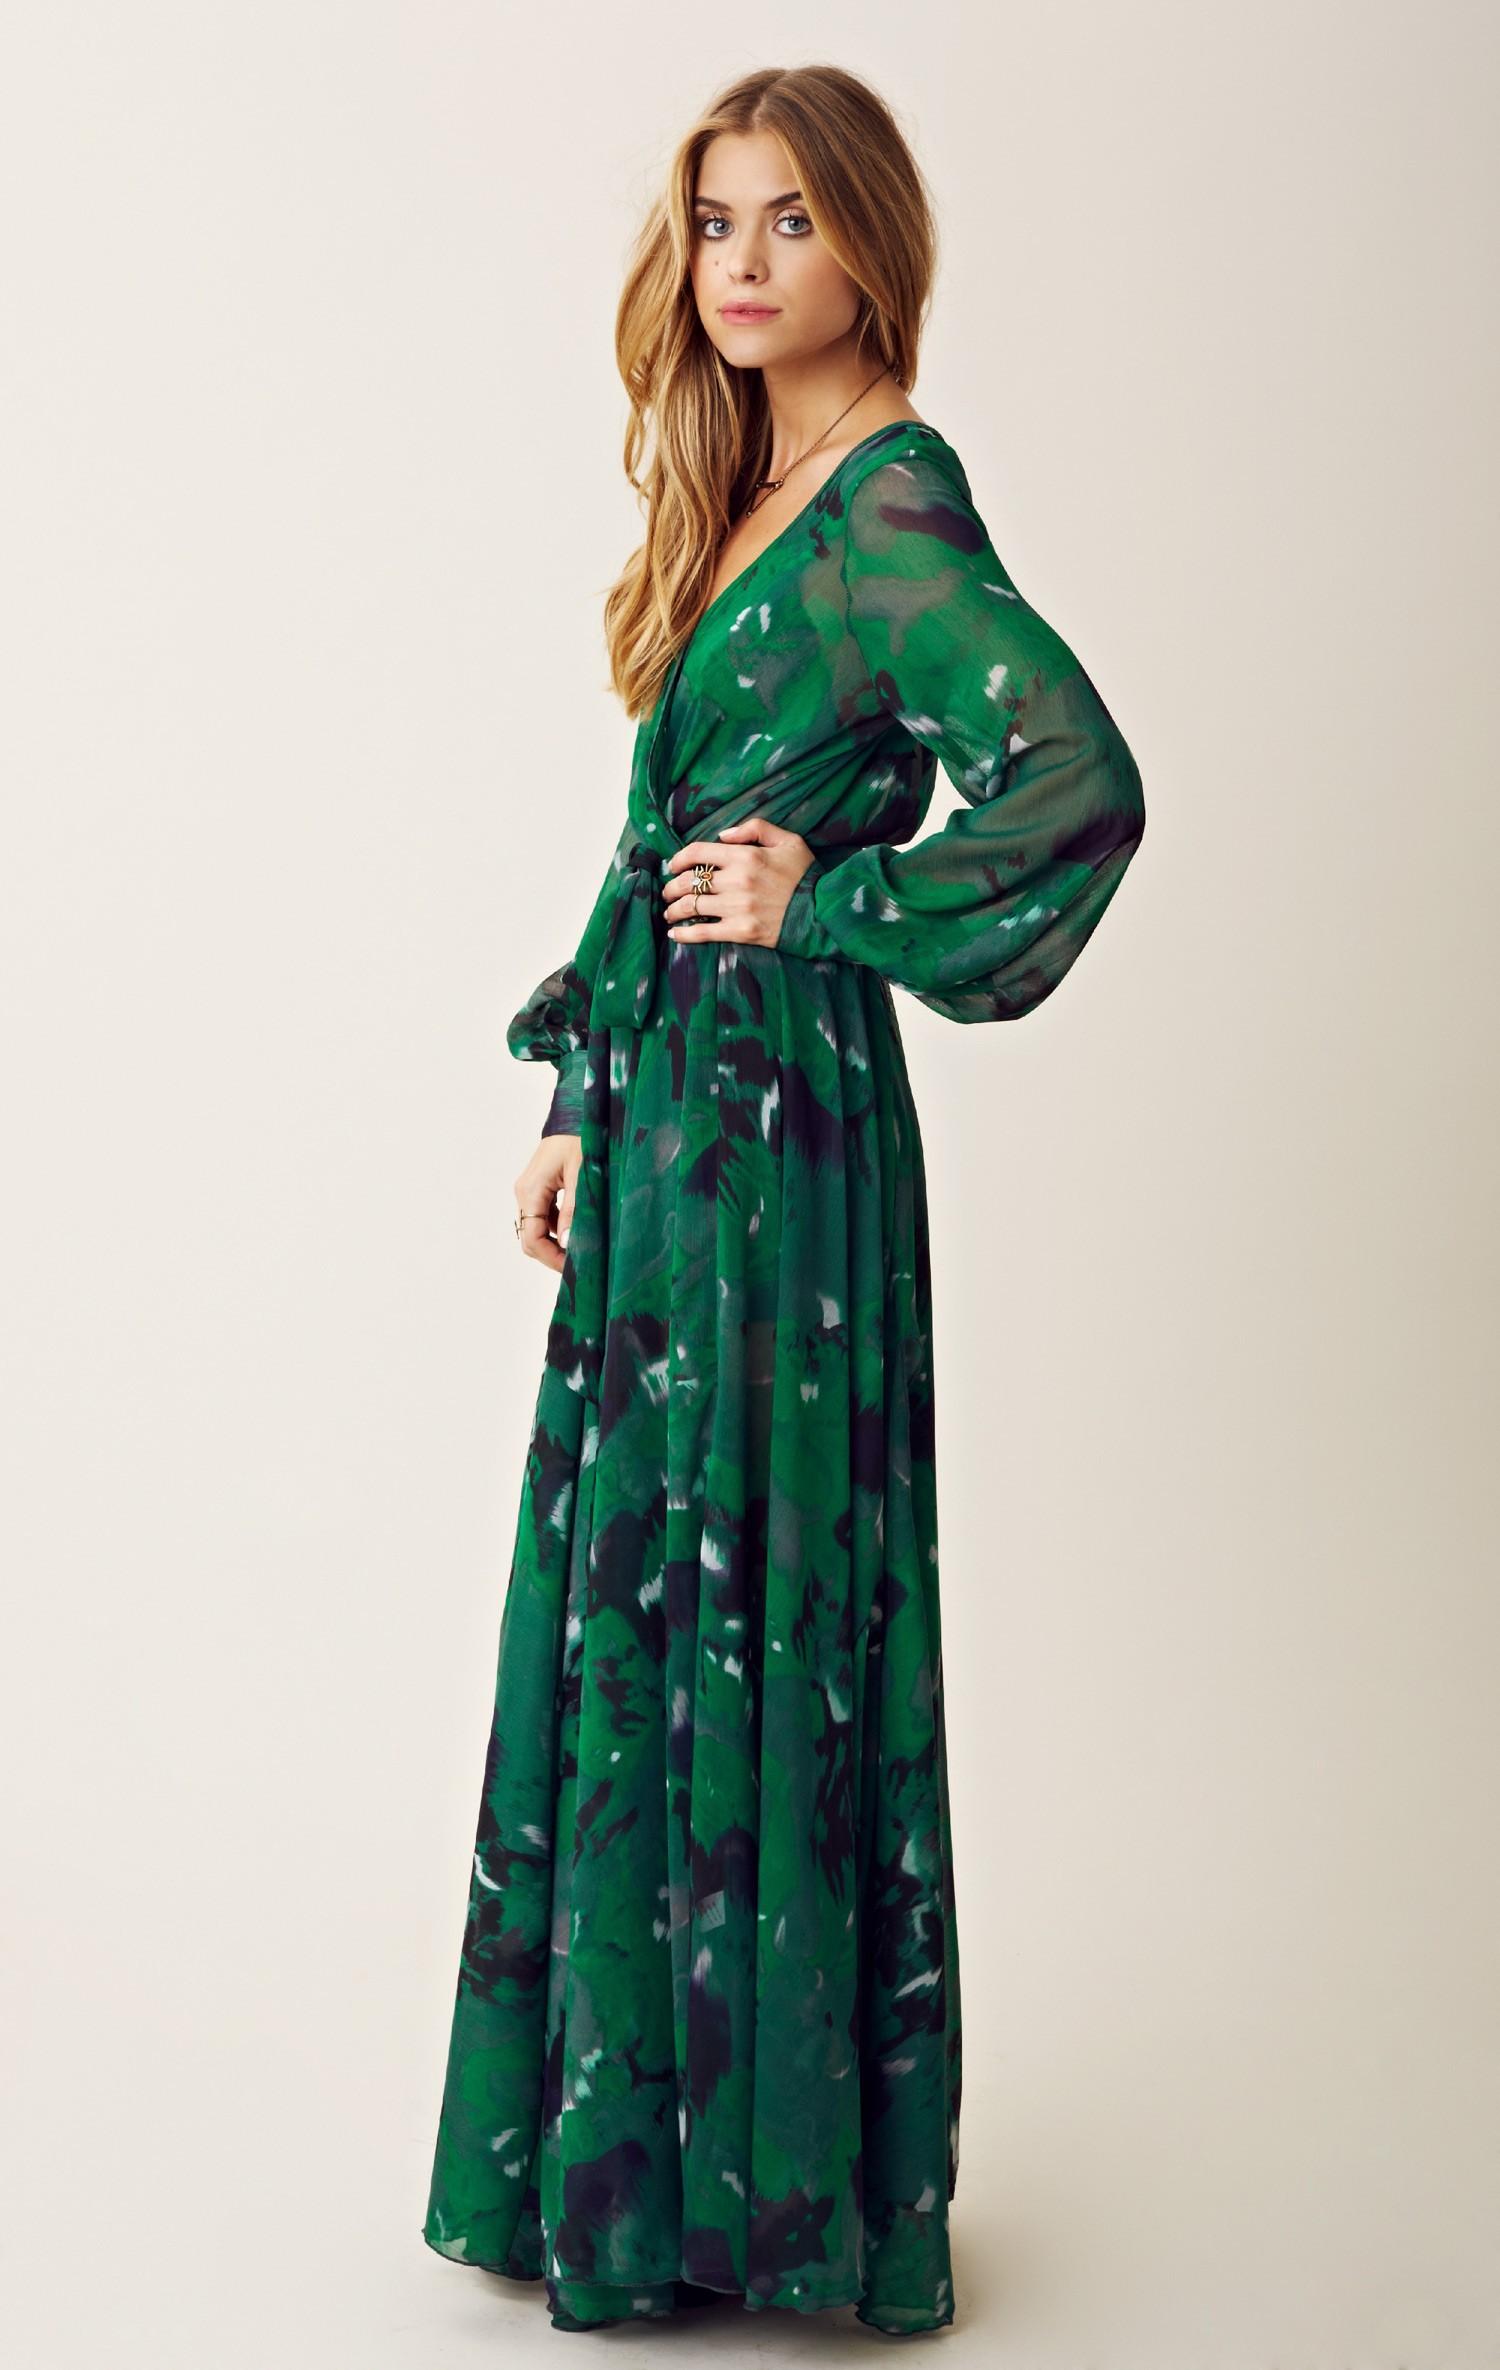 Blu moon Crepe Wrap Maxi Dress in Green | Lyst